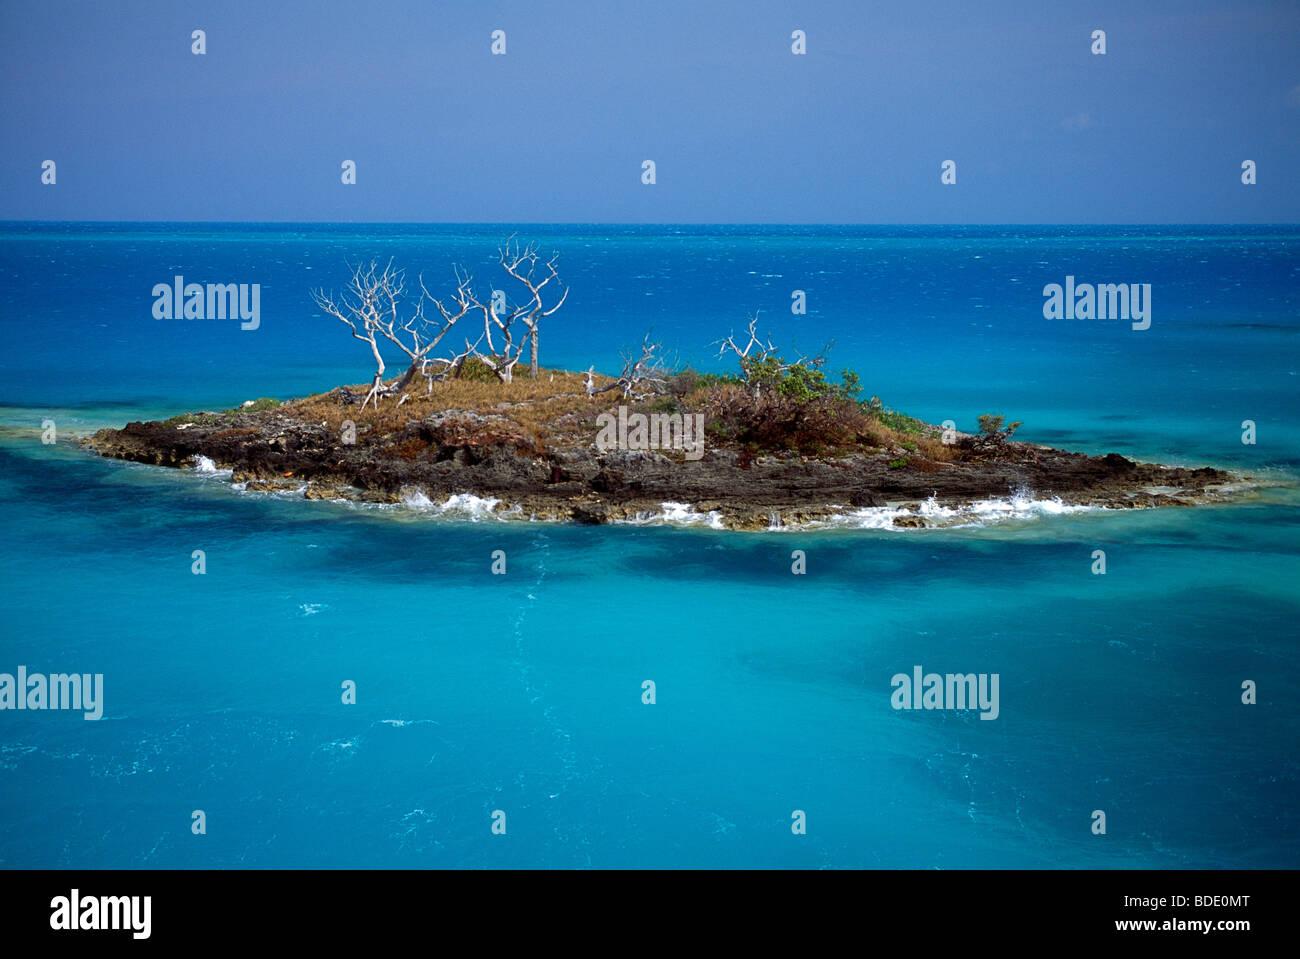 "Tiny Bermuda Chevron"" Bandana Bib – BibbyBubby"